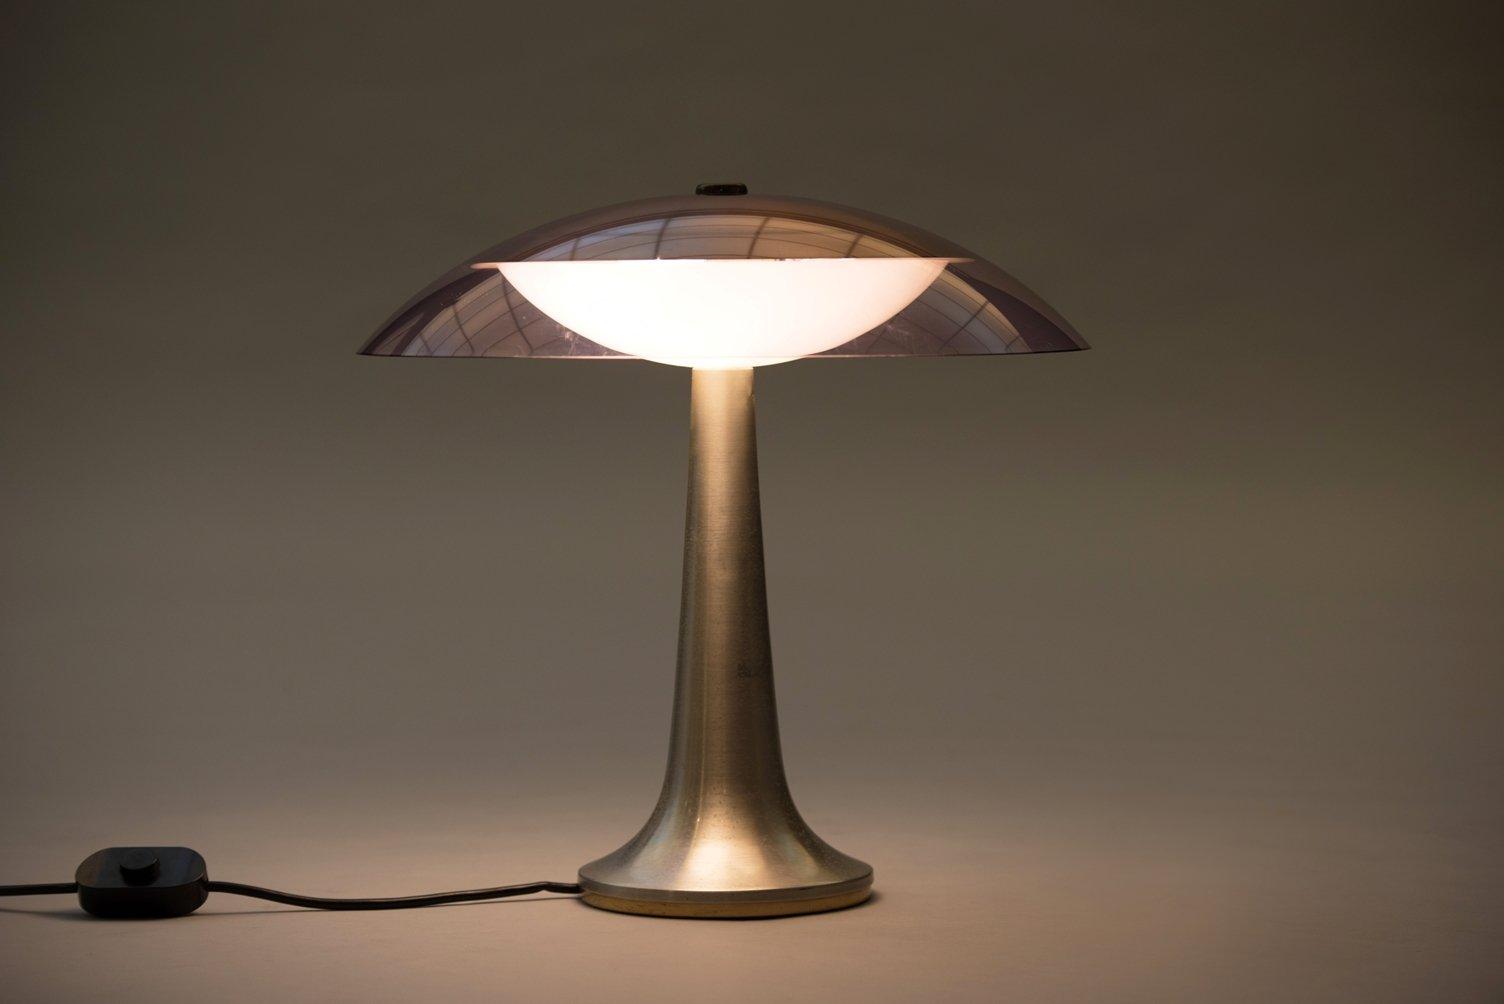 Lampe de Bureau Vintage de Stilux Milano en vente sur Pamono